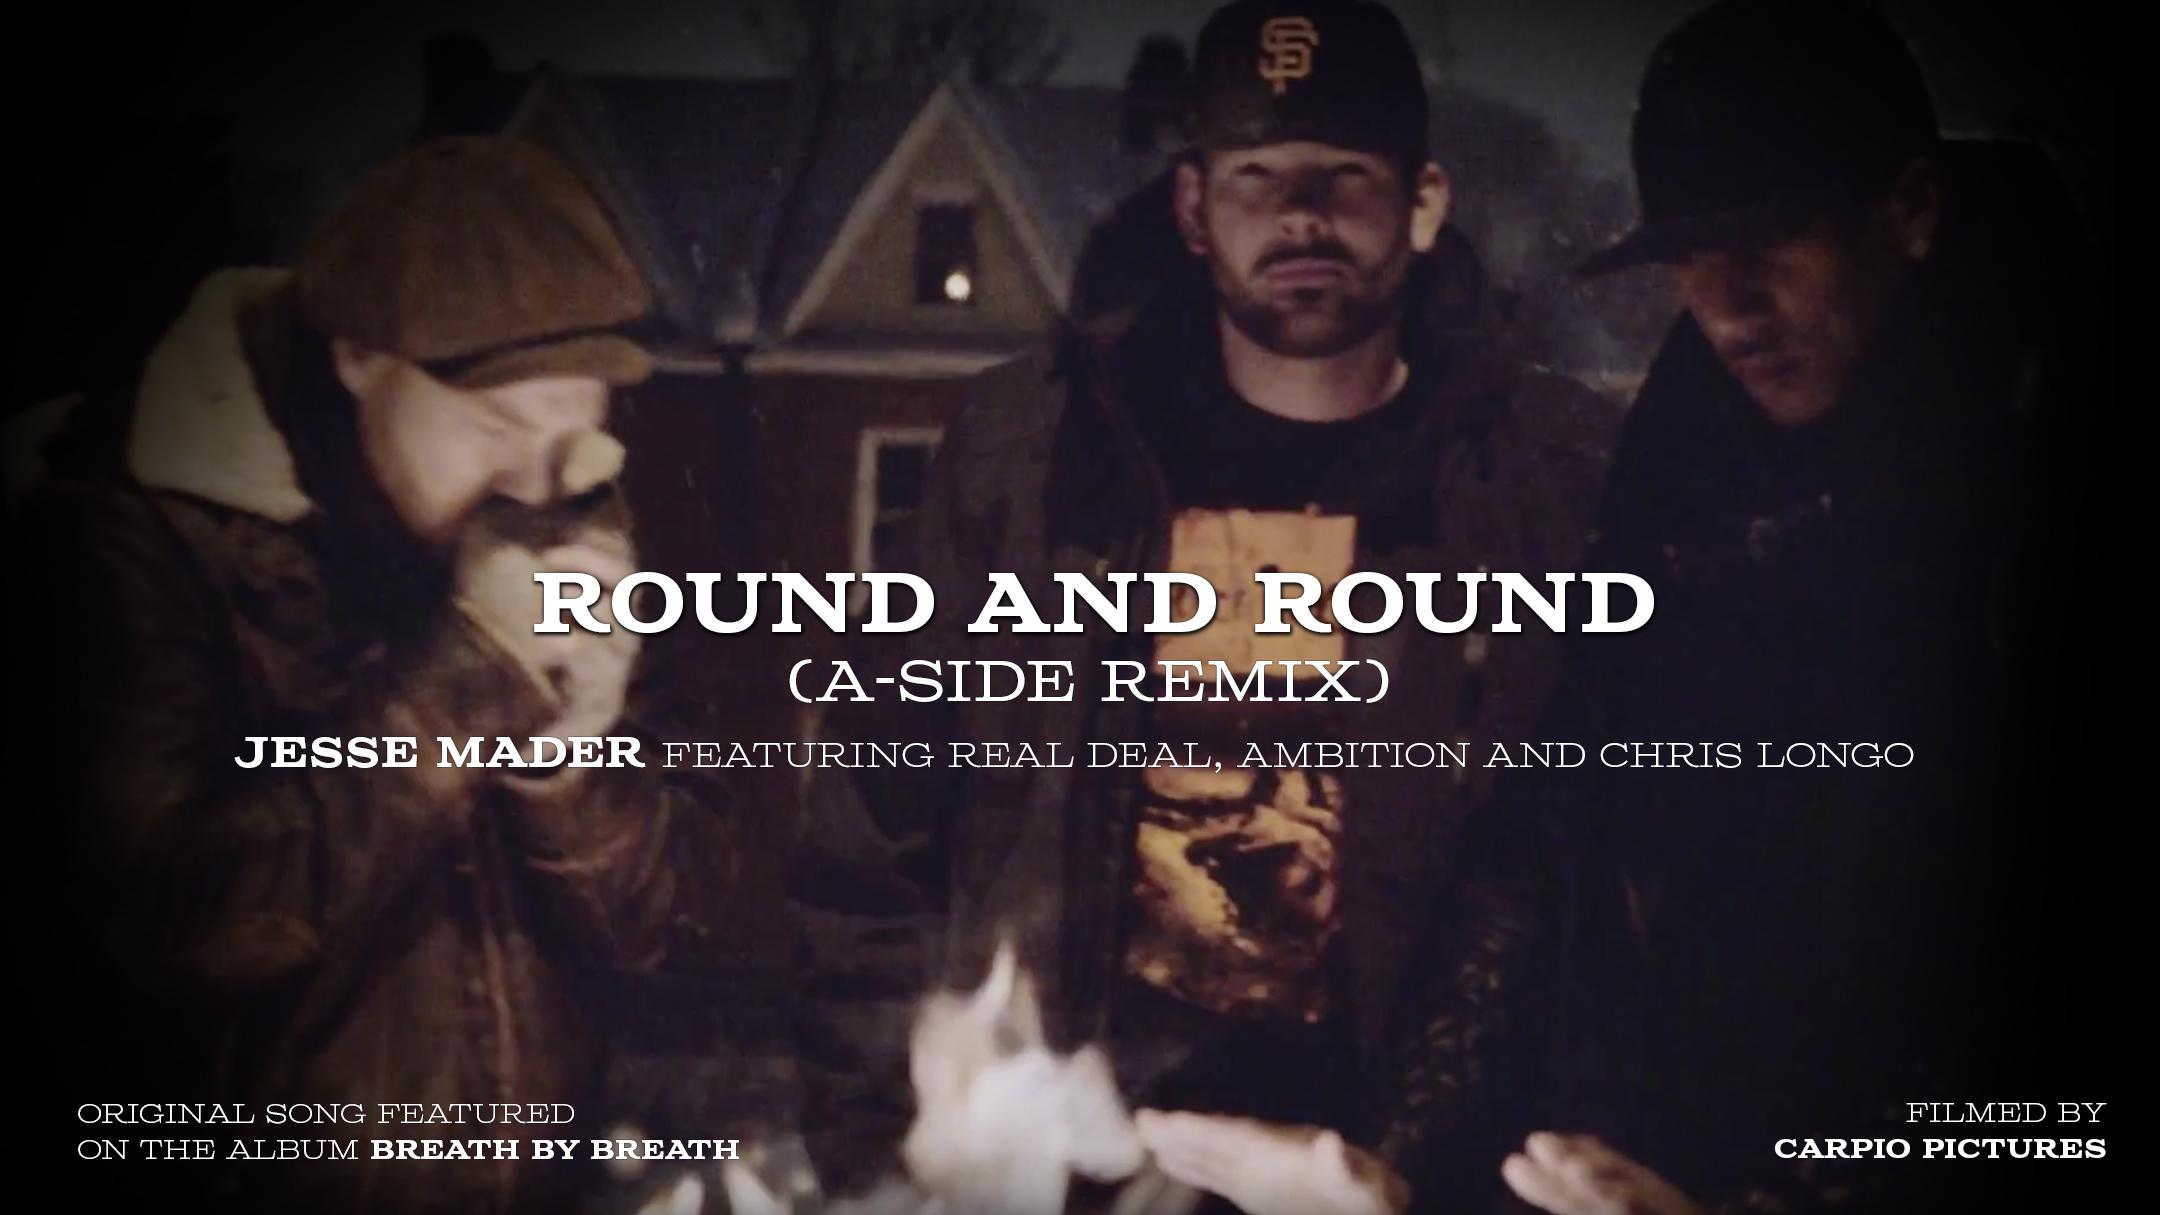 jesse-mader-round-and-round-remix-youtube-thumbnail